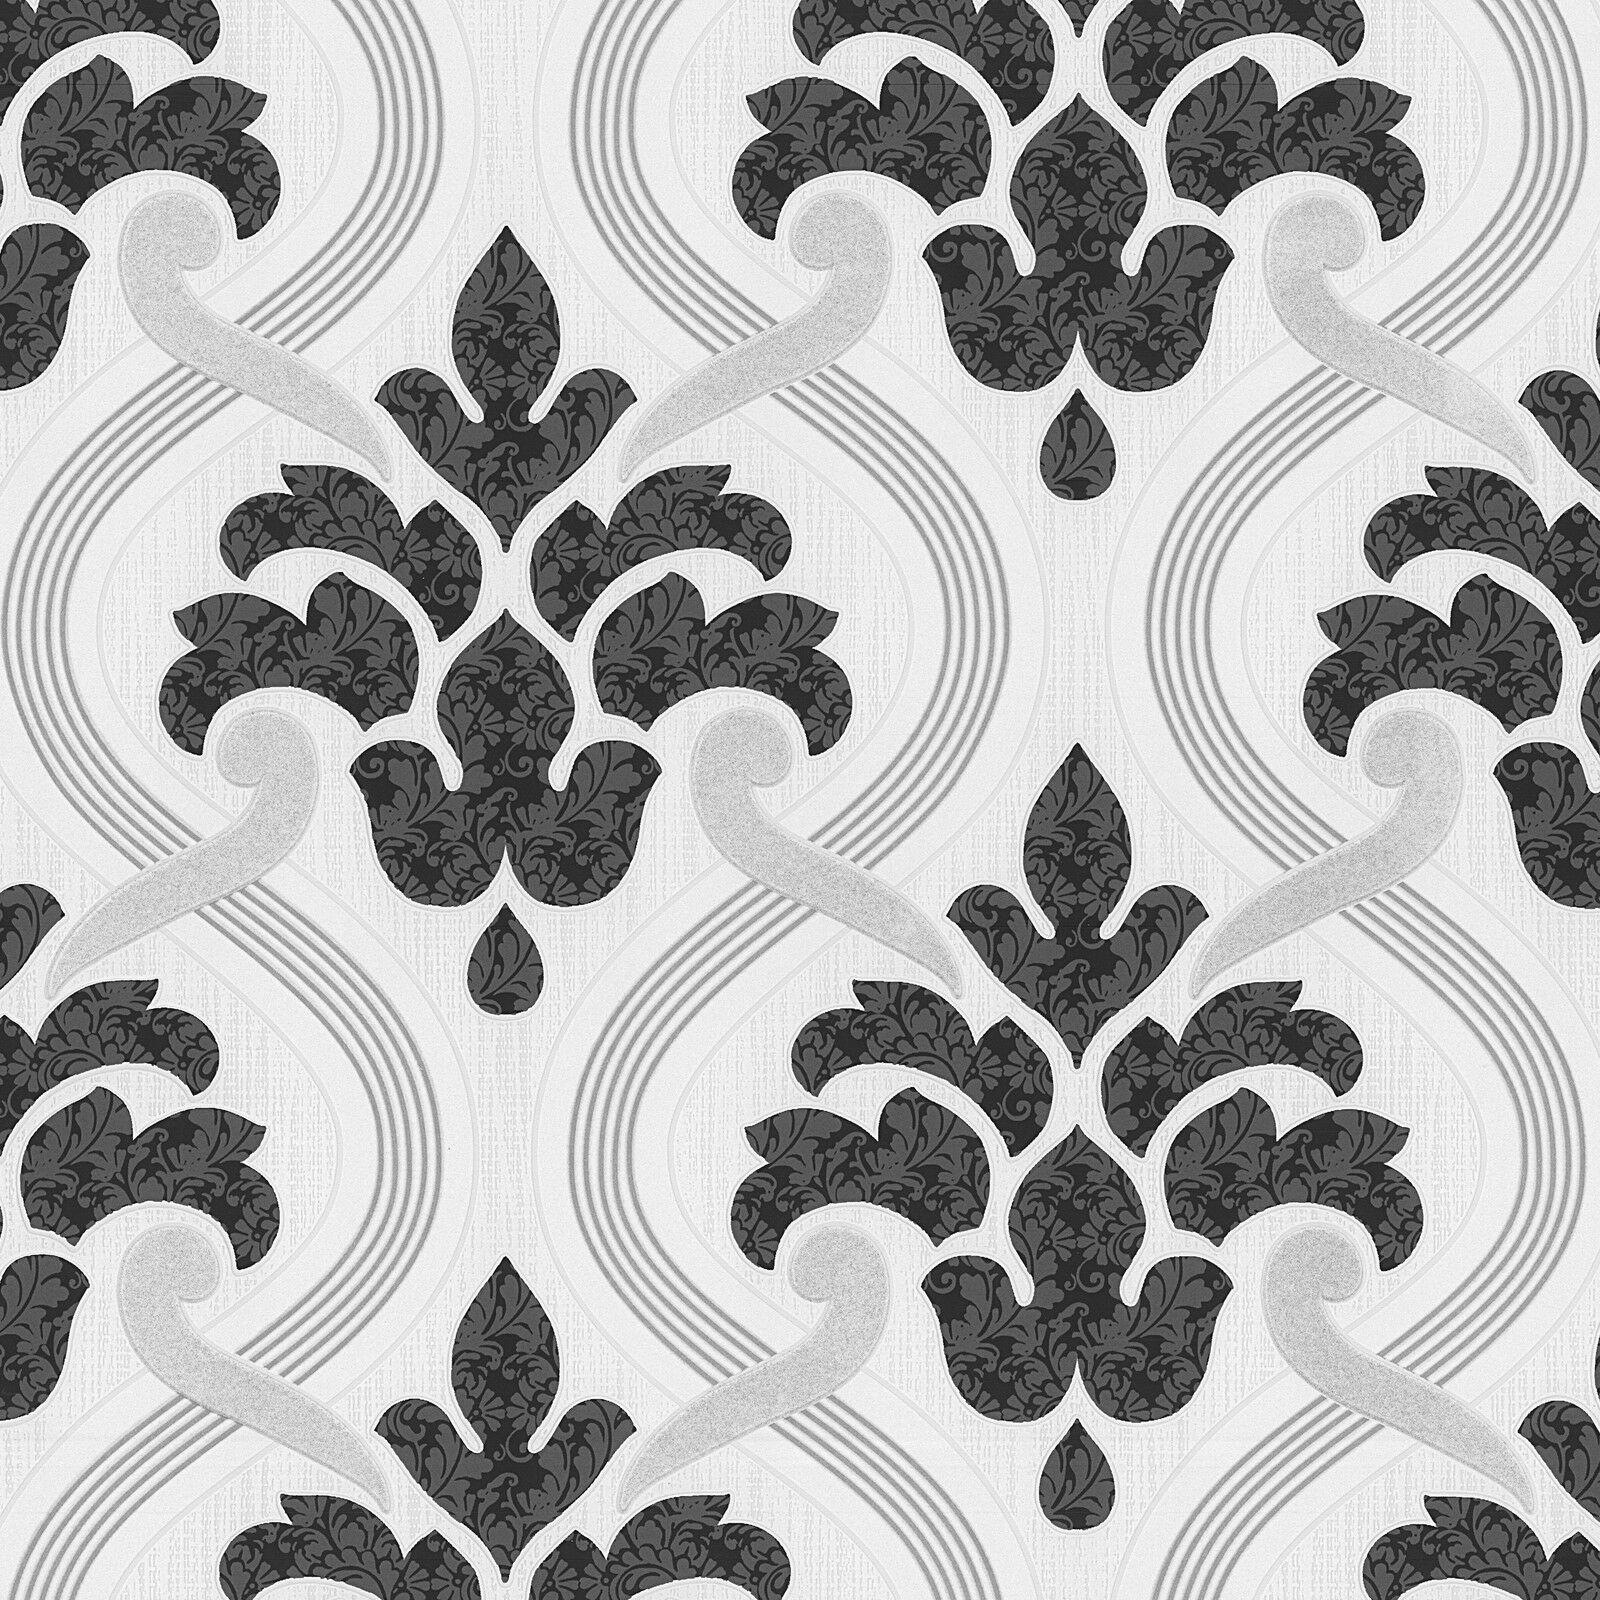 vlies tapete barock muster ornament schwarz wei metallic glitzer 1 - Tapete Schwarz Weis Muster